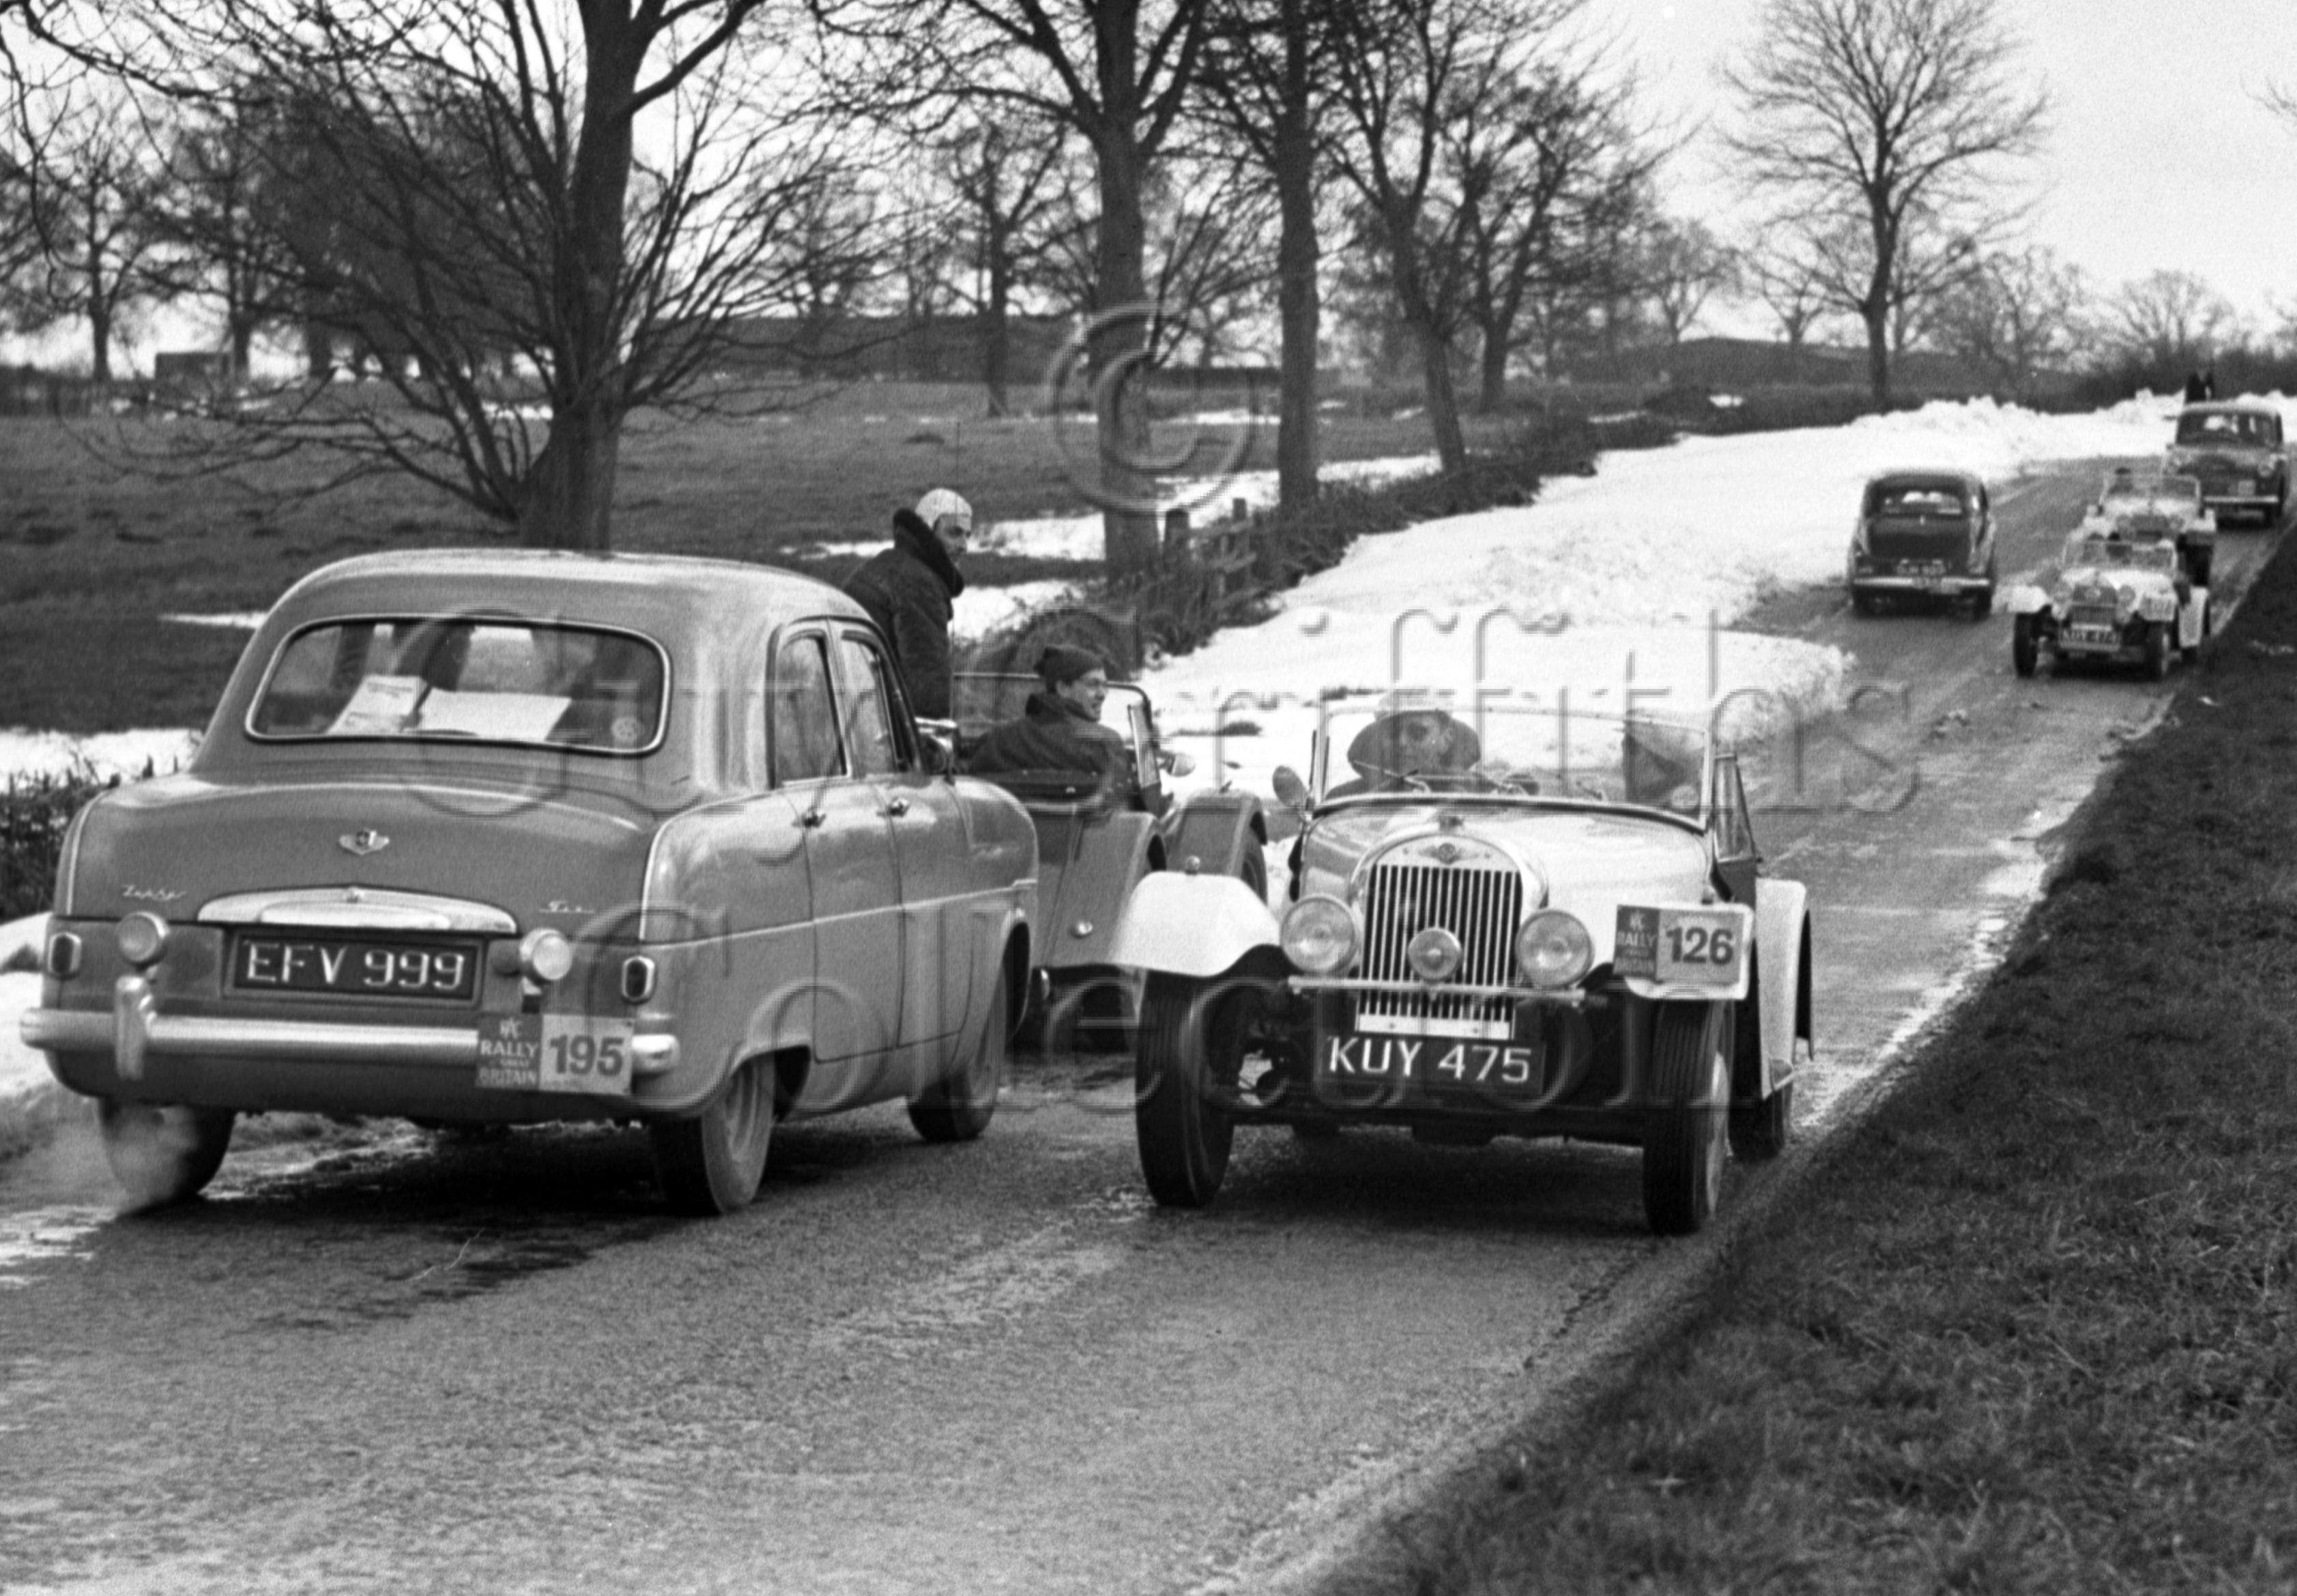 51-396–J-G-Reece–Morgan-Plus-4–KUY-475–RAC-Rally–31-03-1952.jpg - Guy Griffiths Collection